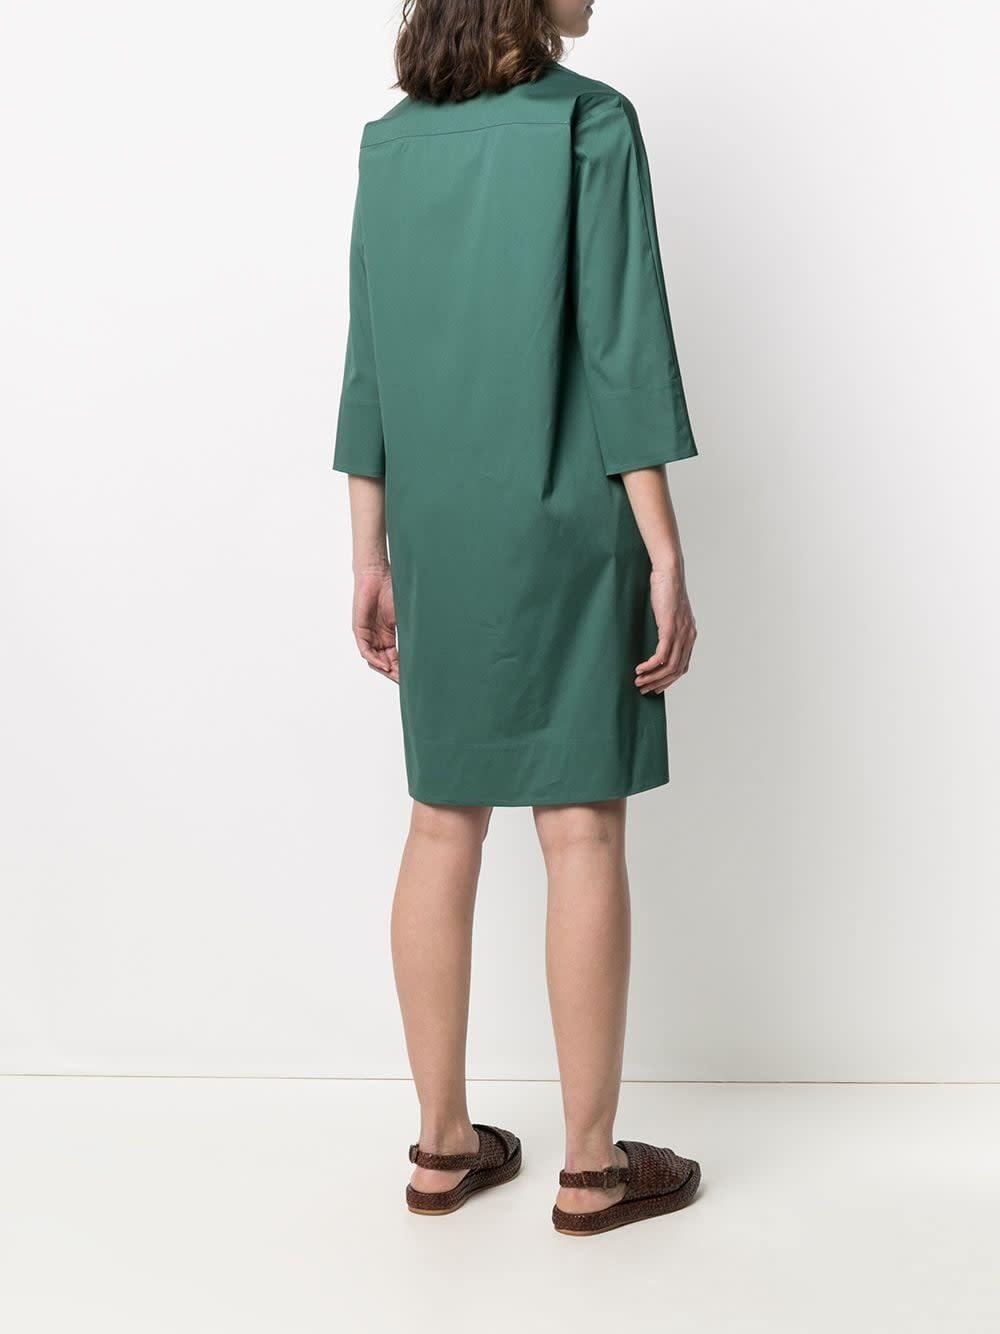 Melania dress antonelli-4